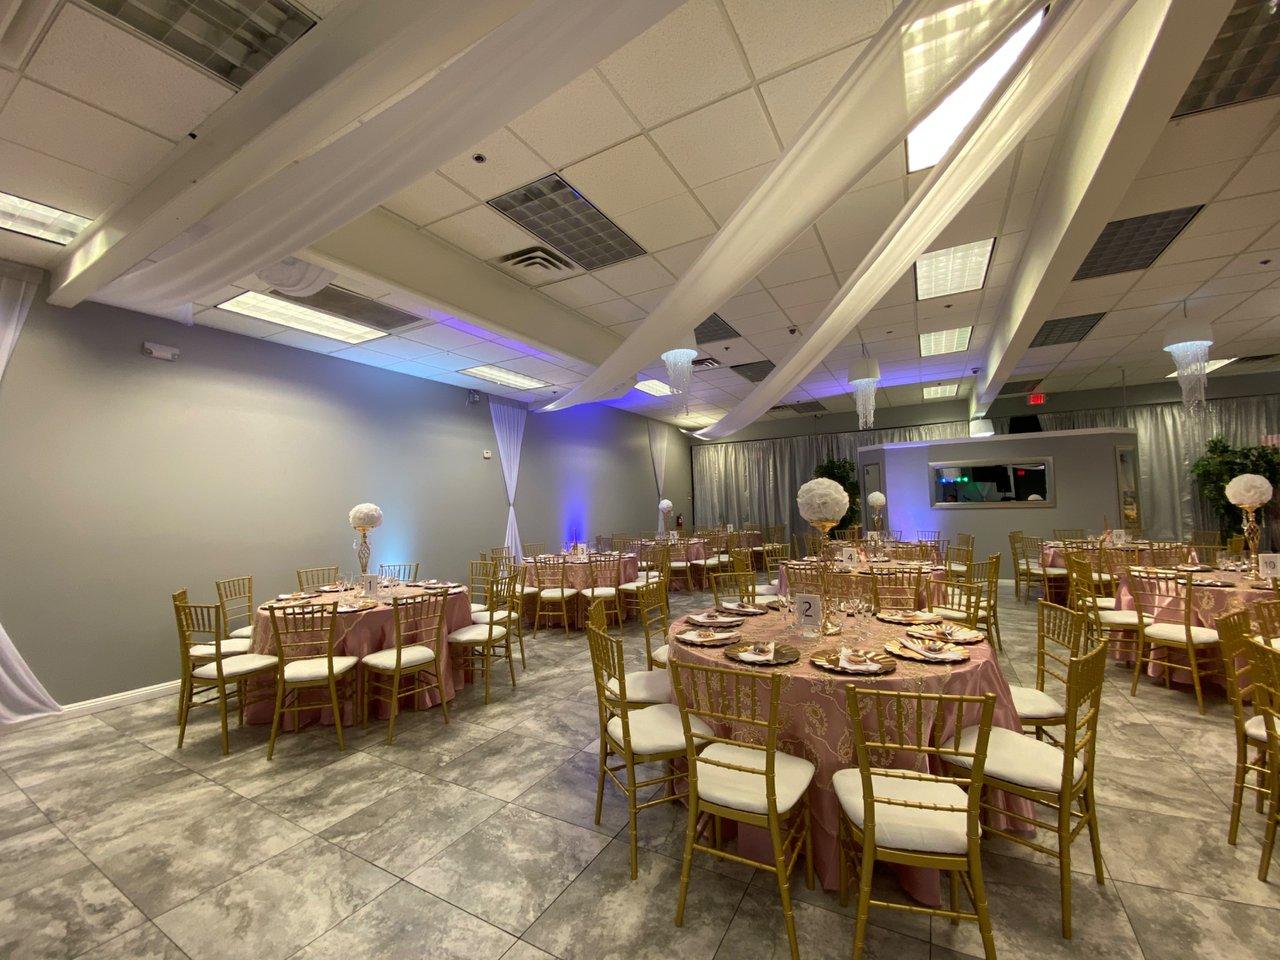 Mi Rincón banquet hall event photo D3FEFE29-42E3-463E-A1B4-2E4DB9D00DC8.jpg